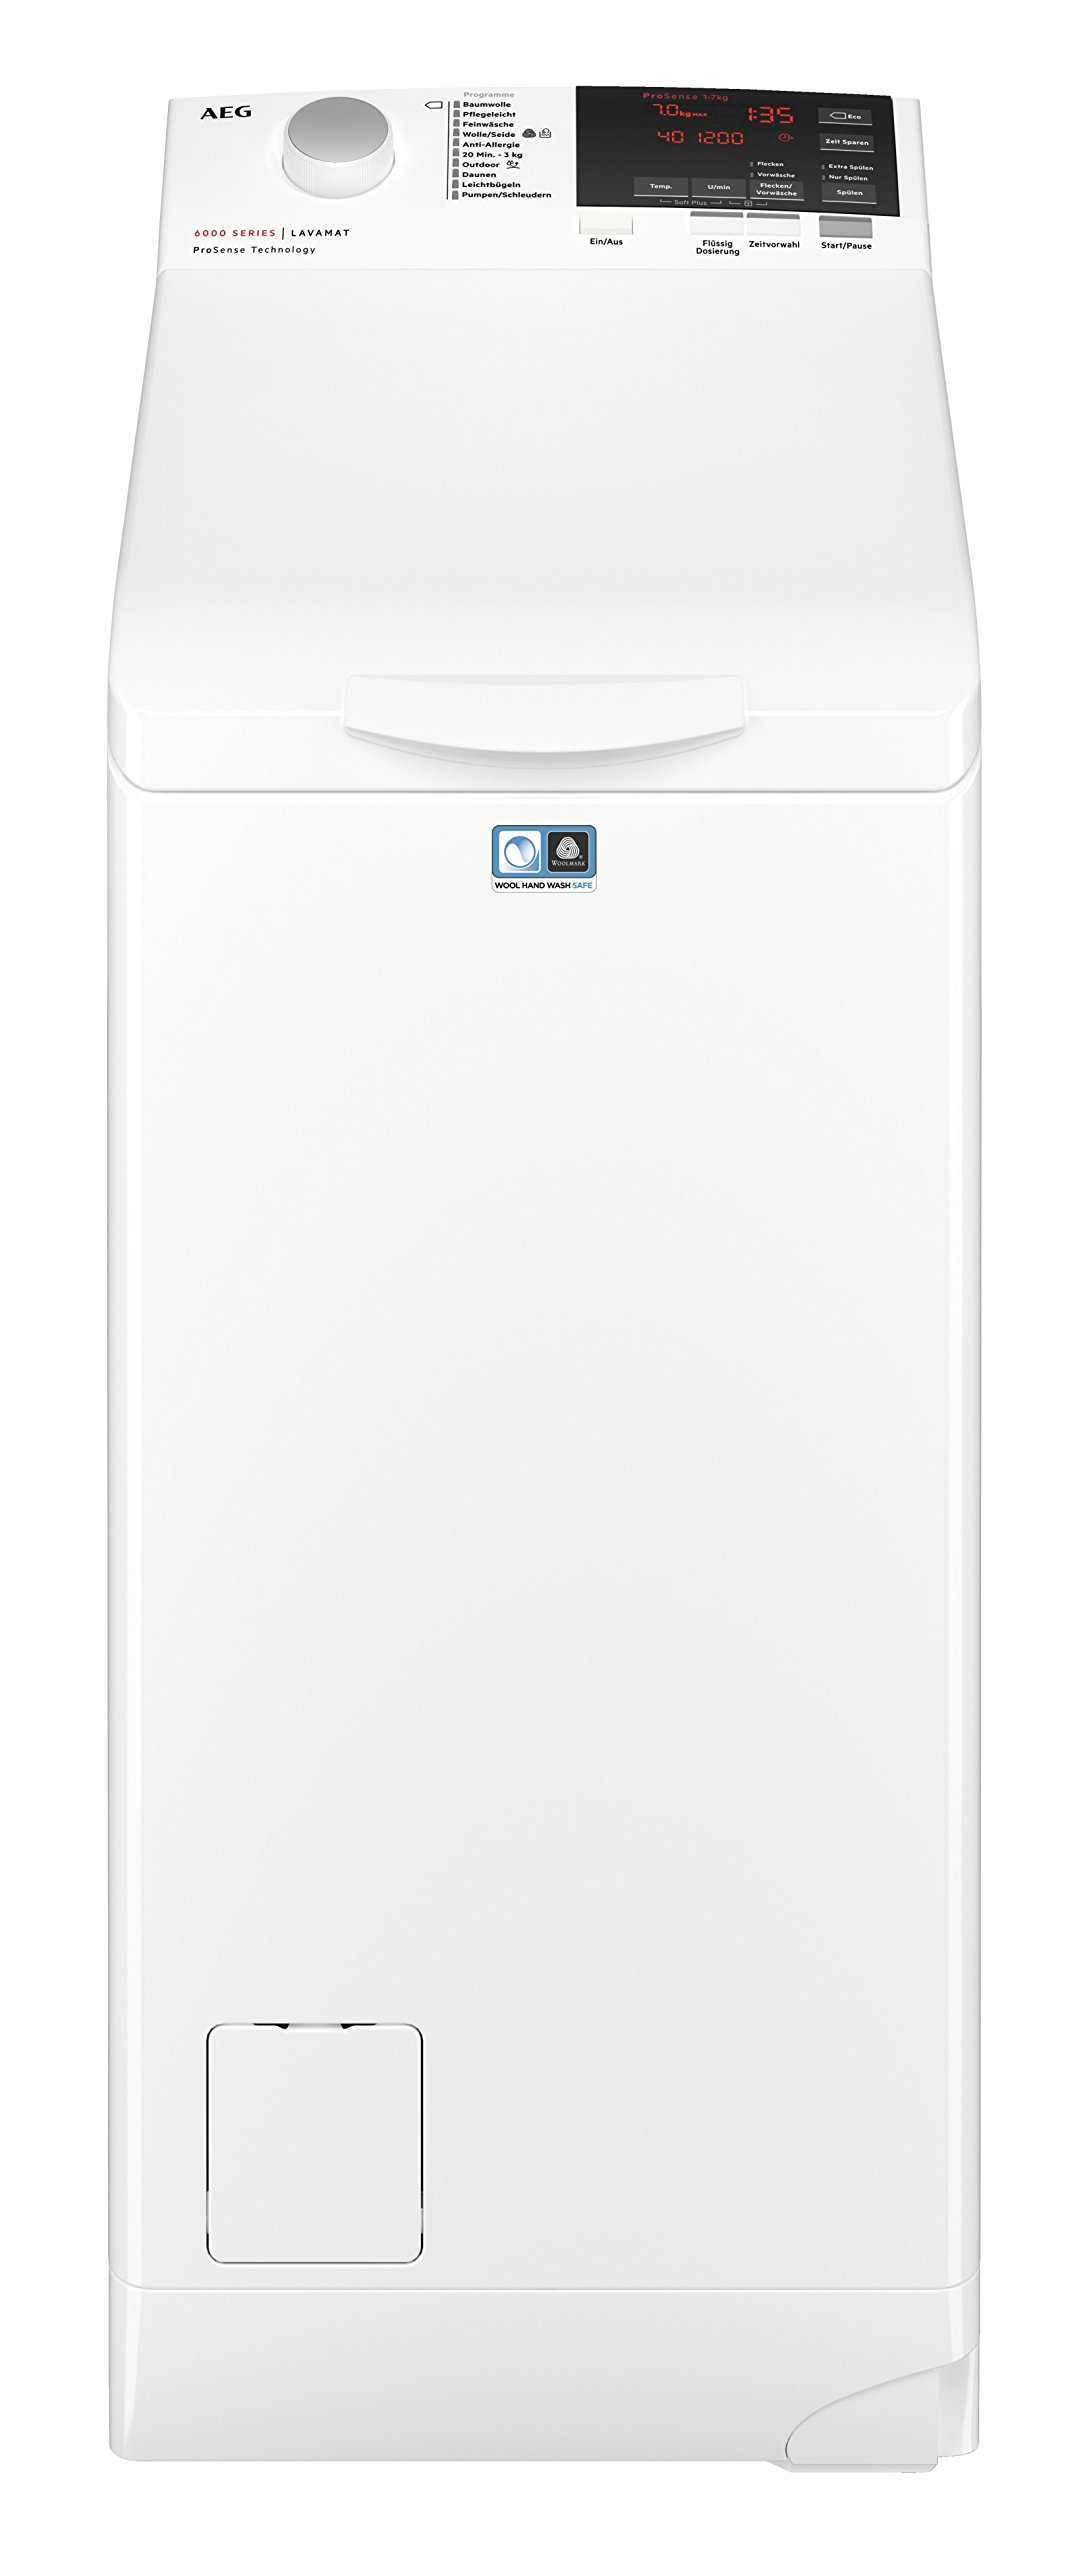 AEG L6TB61370 Waschmaschine Toplader, Waschvollautomat, 7 kg Füllmenge